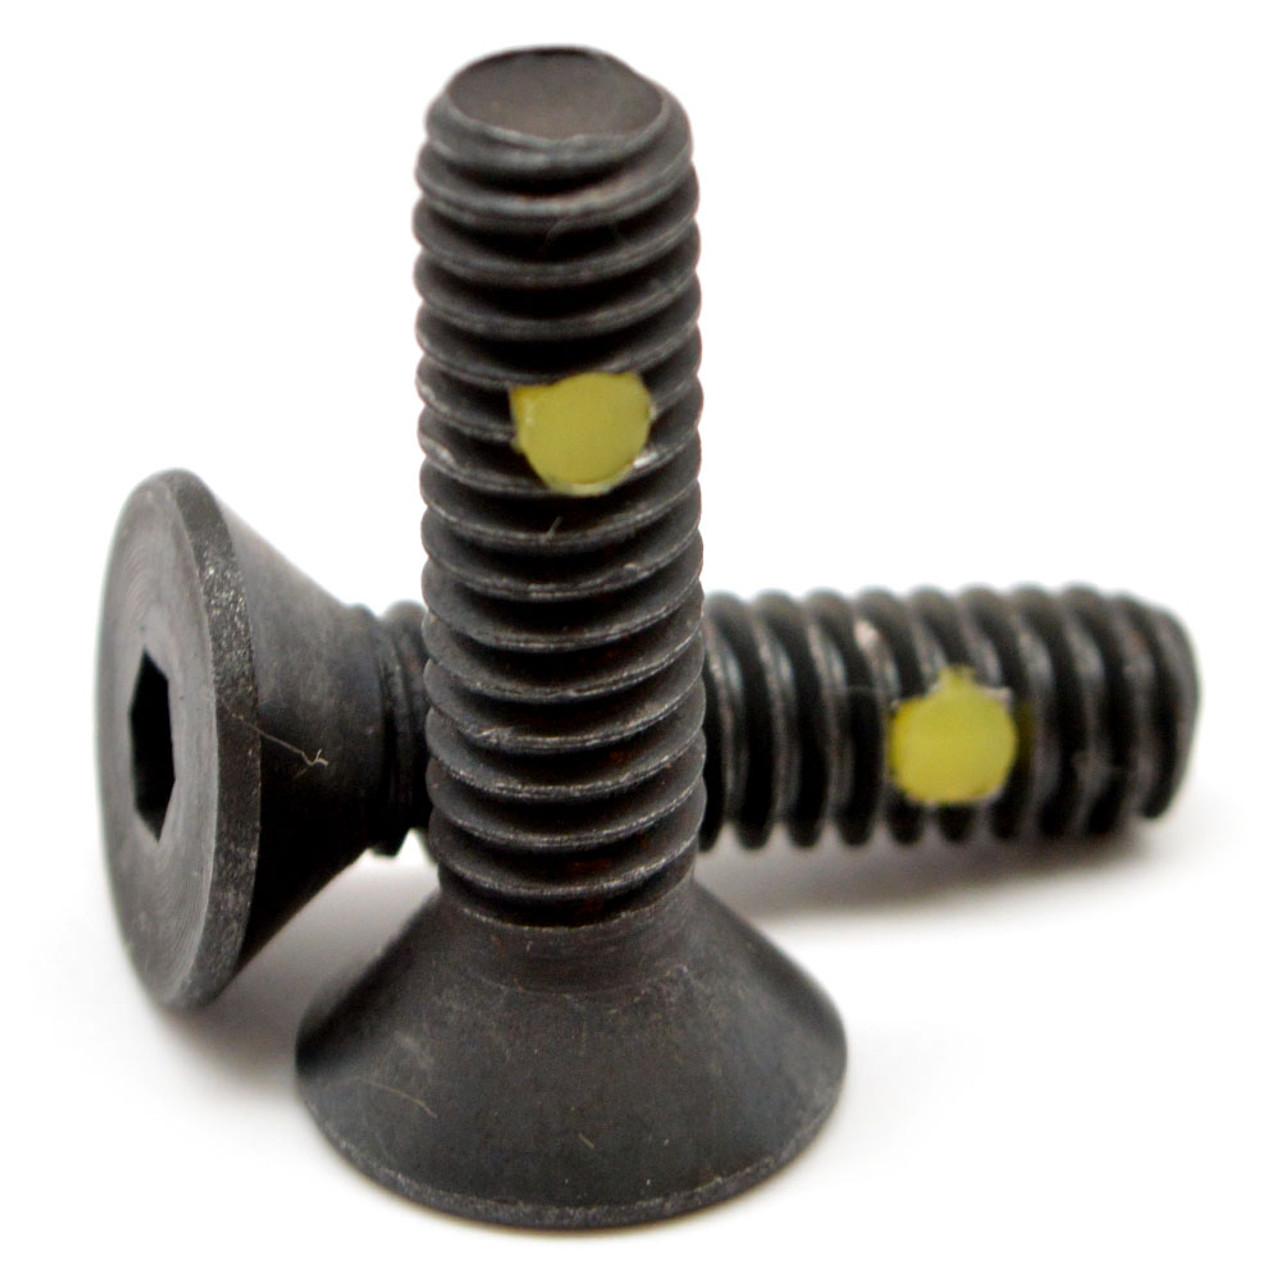 "3//8/""-16 x 1/"" Coarse Thread Socket Flat Hd Cap Screw Black Oxide FT"